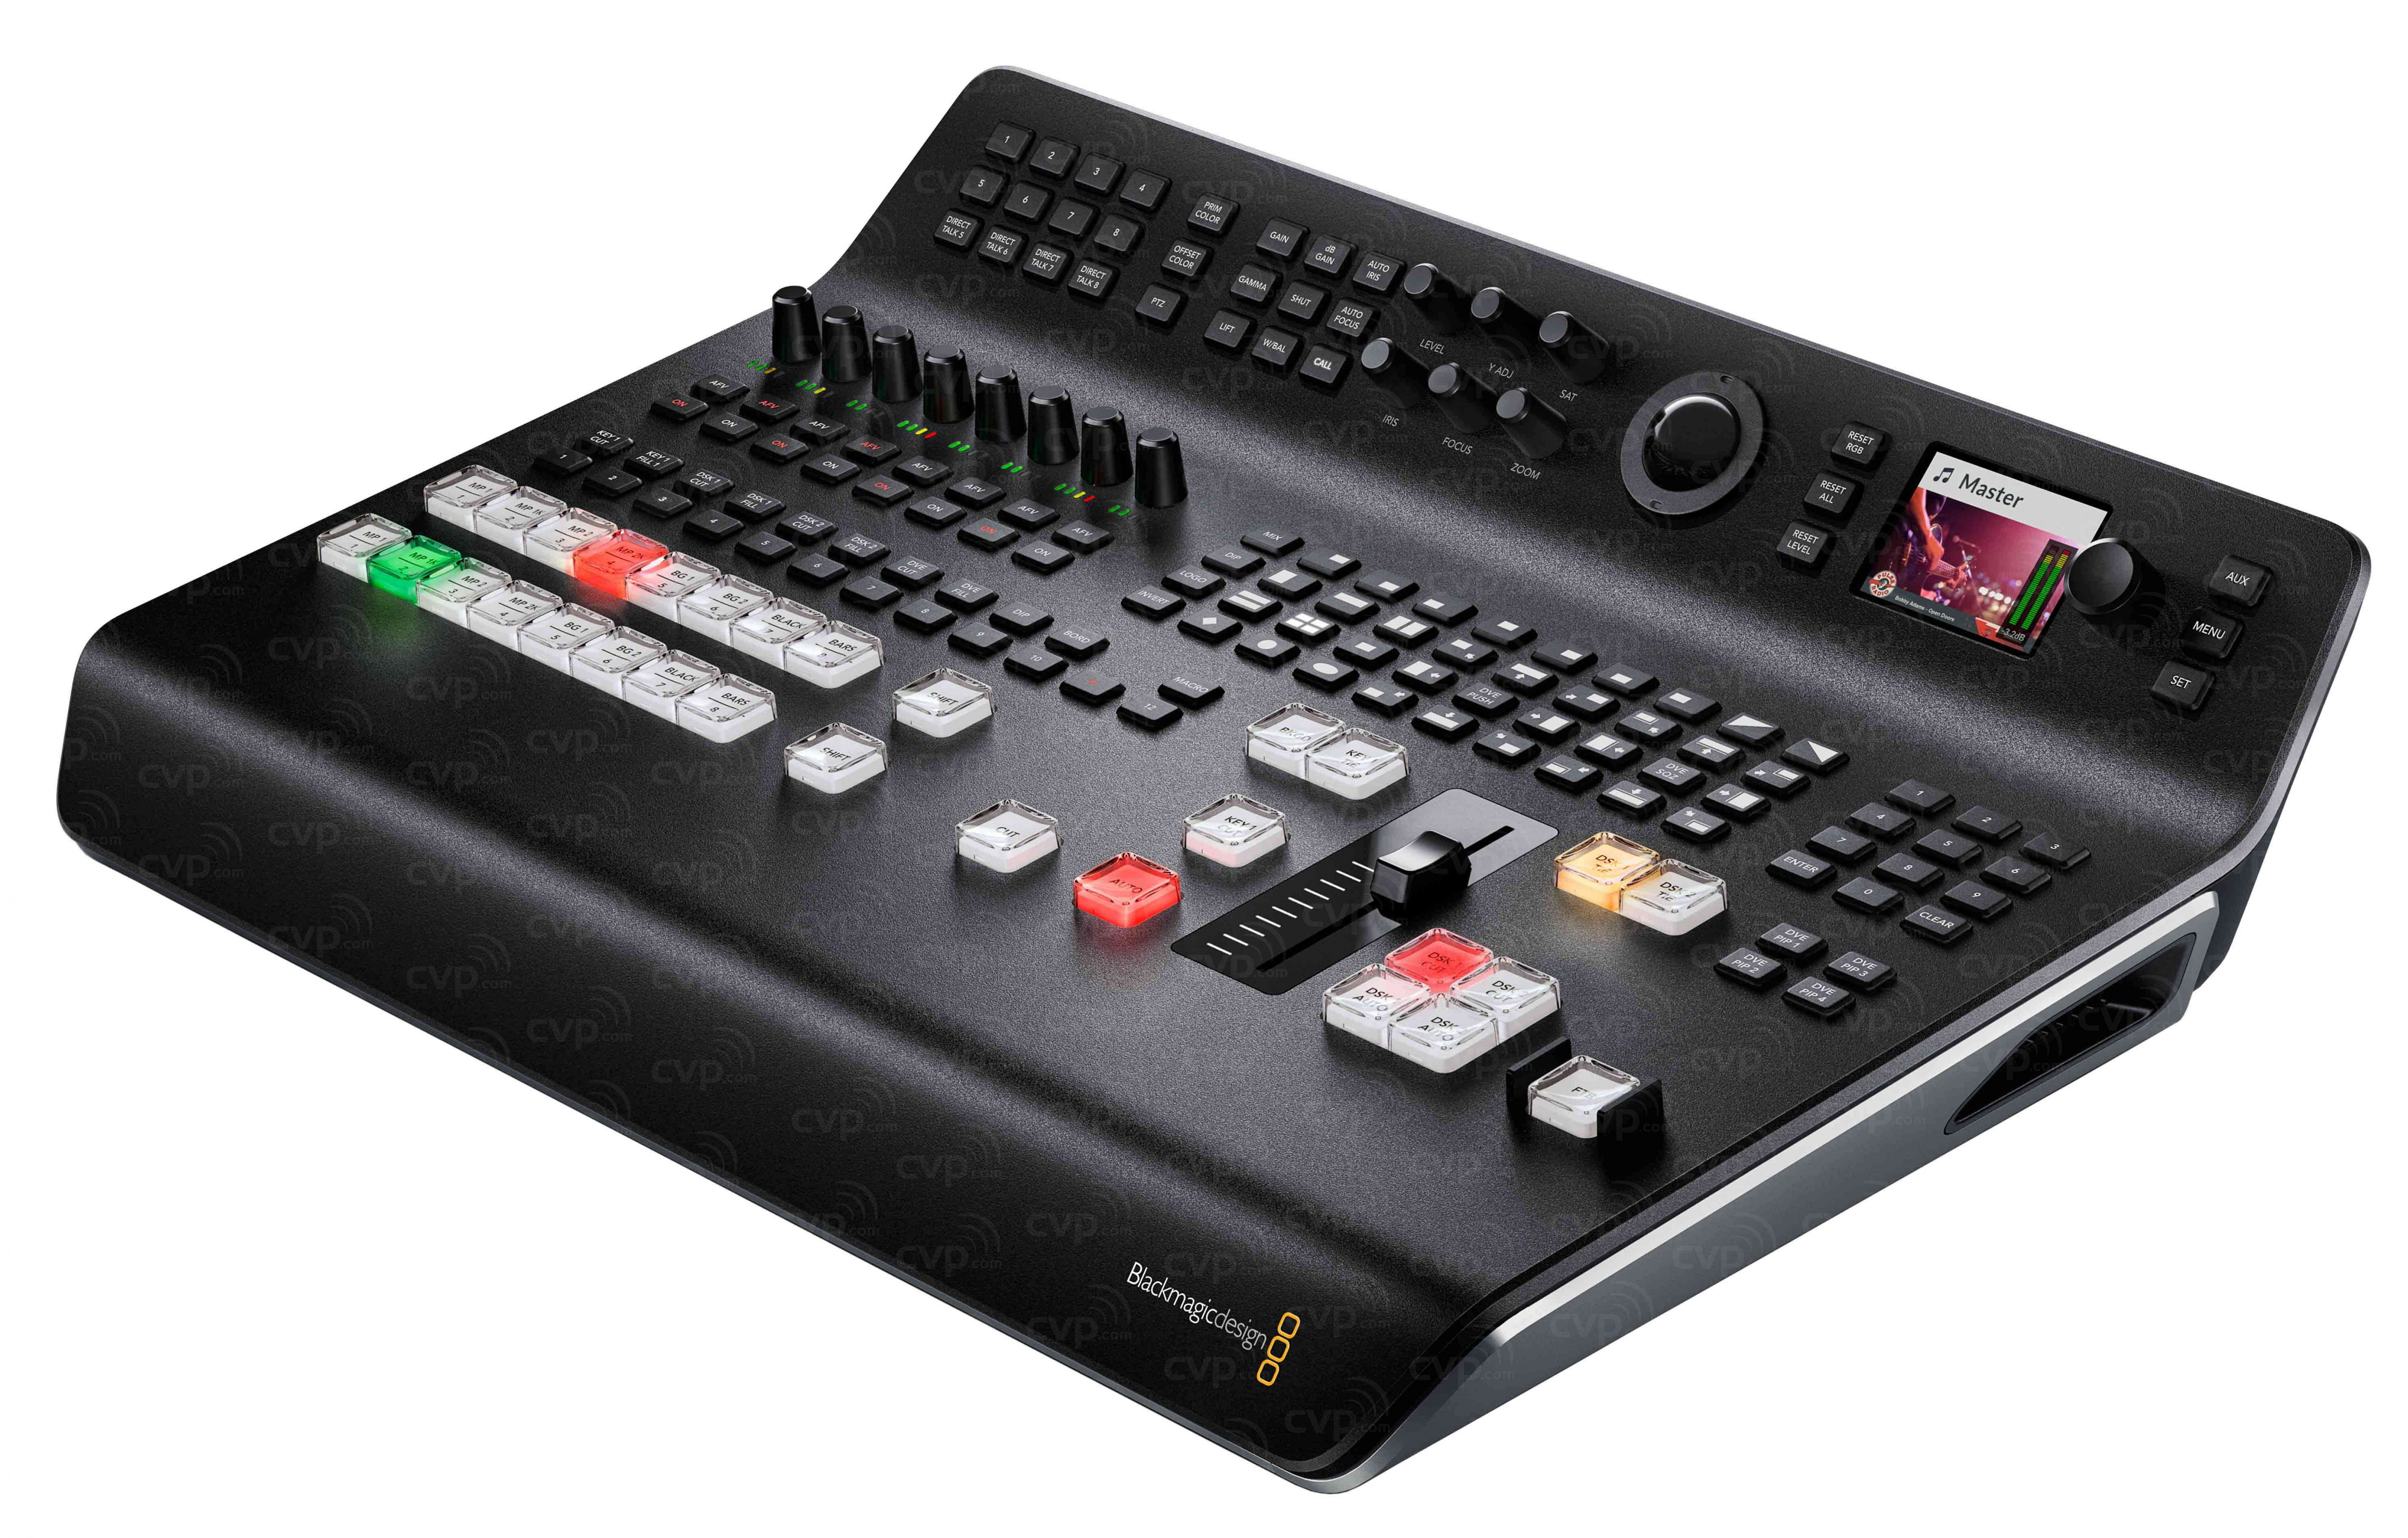 Blackmagic Design BMD-SWATEMTVSTU/PROHD (BMDSWATEMTVSTUPROHD) ATEM Television Studio Pro HD Live